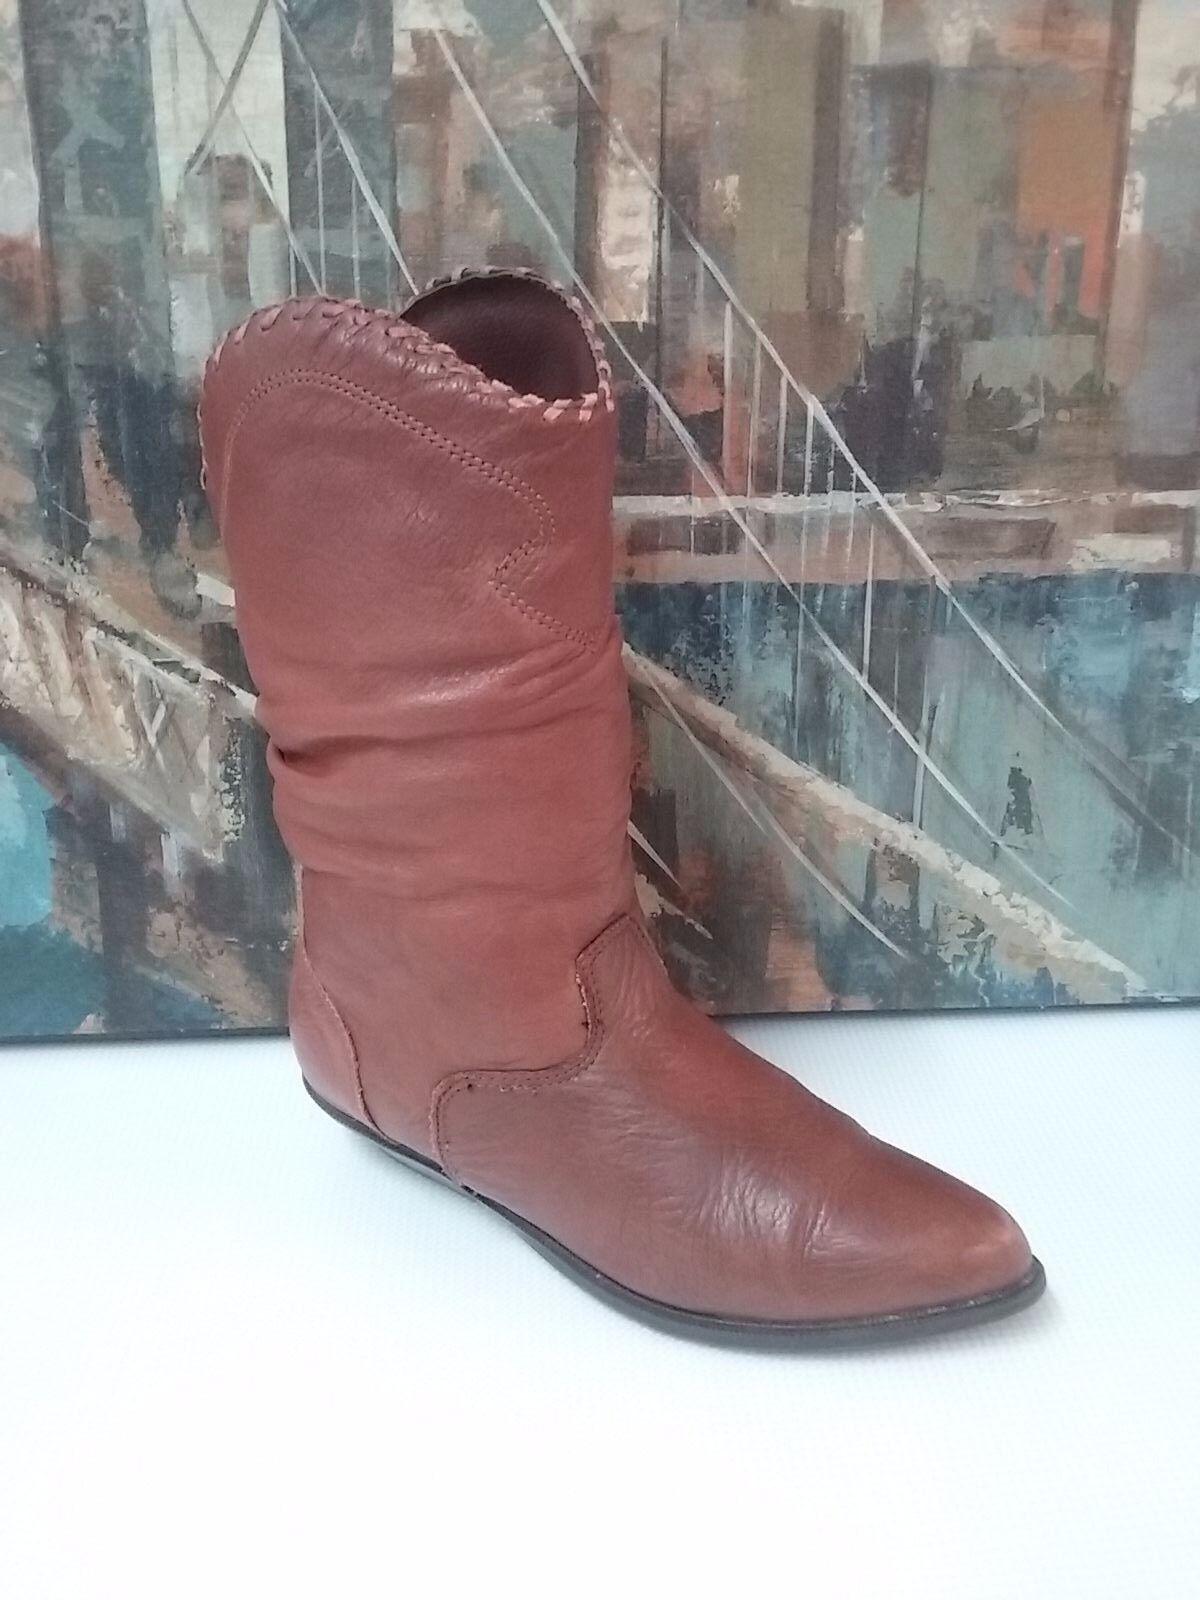 Vintage Zodiac 675 BULLETT 8 M accorn Cuir marron Souple bottes Cowboy Femme